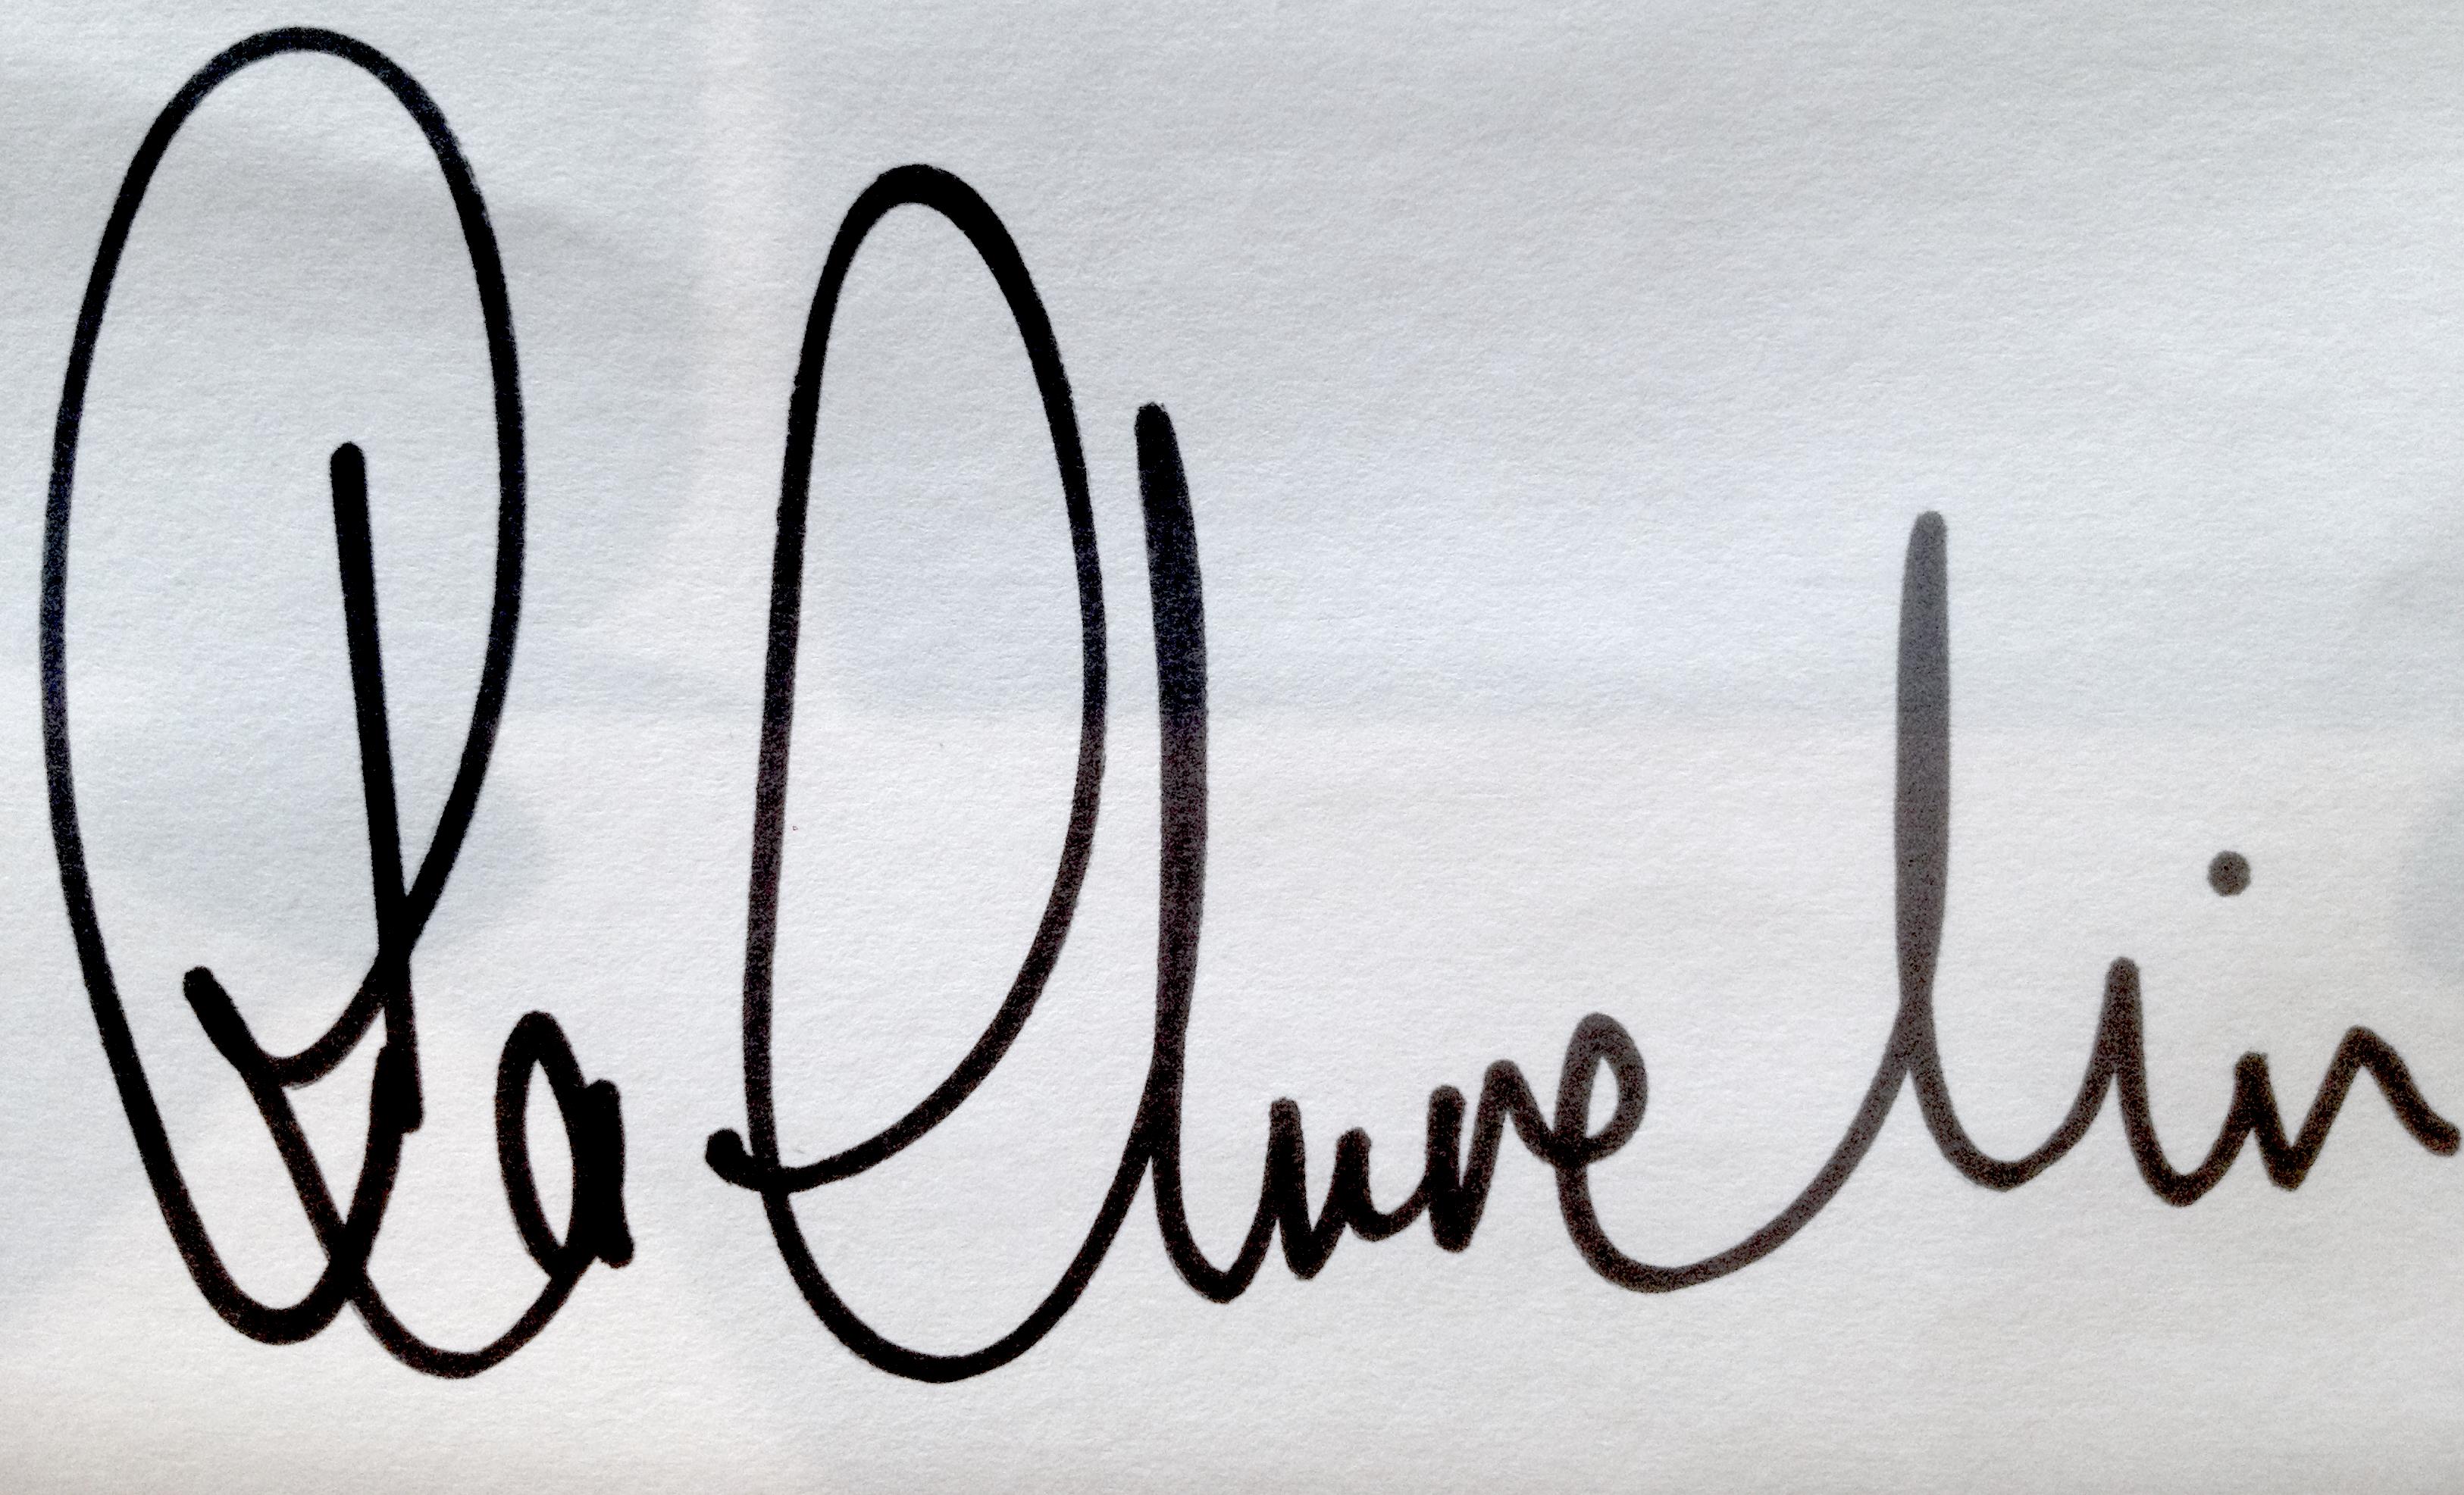 Ra Churchin's Signature